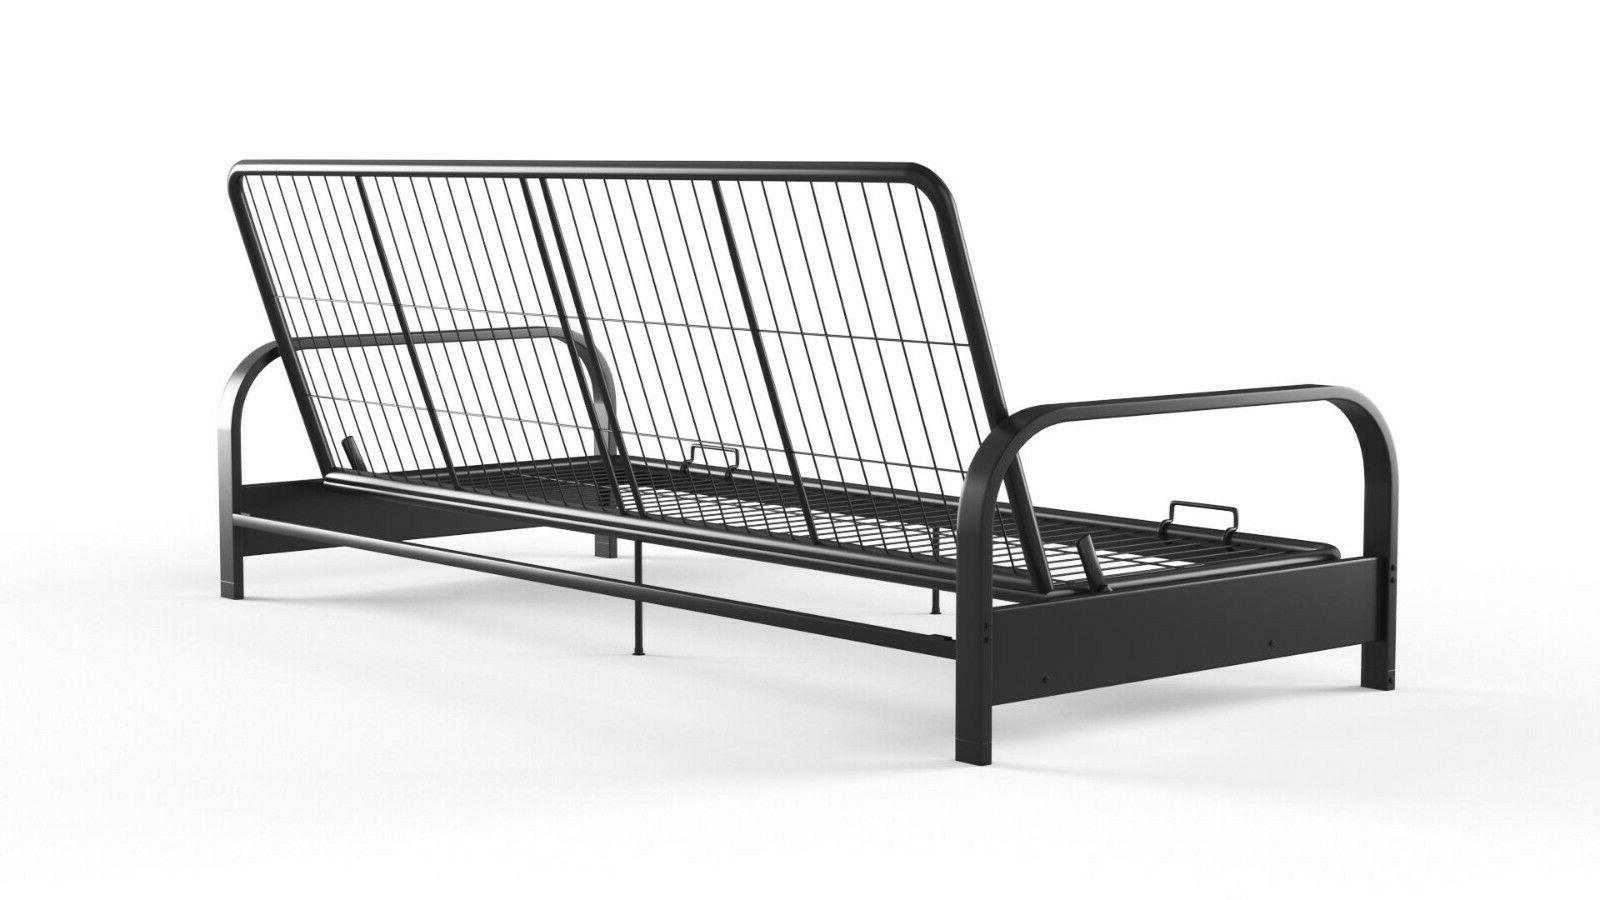 Futon Sleeper Sofa Bed Frame Mattress